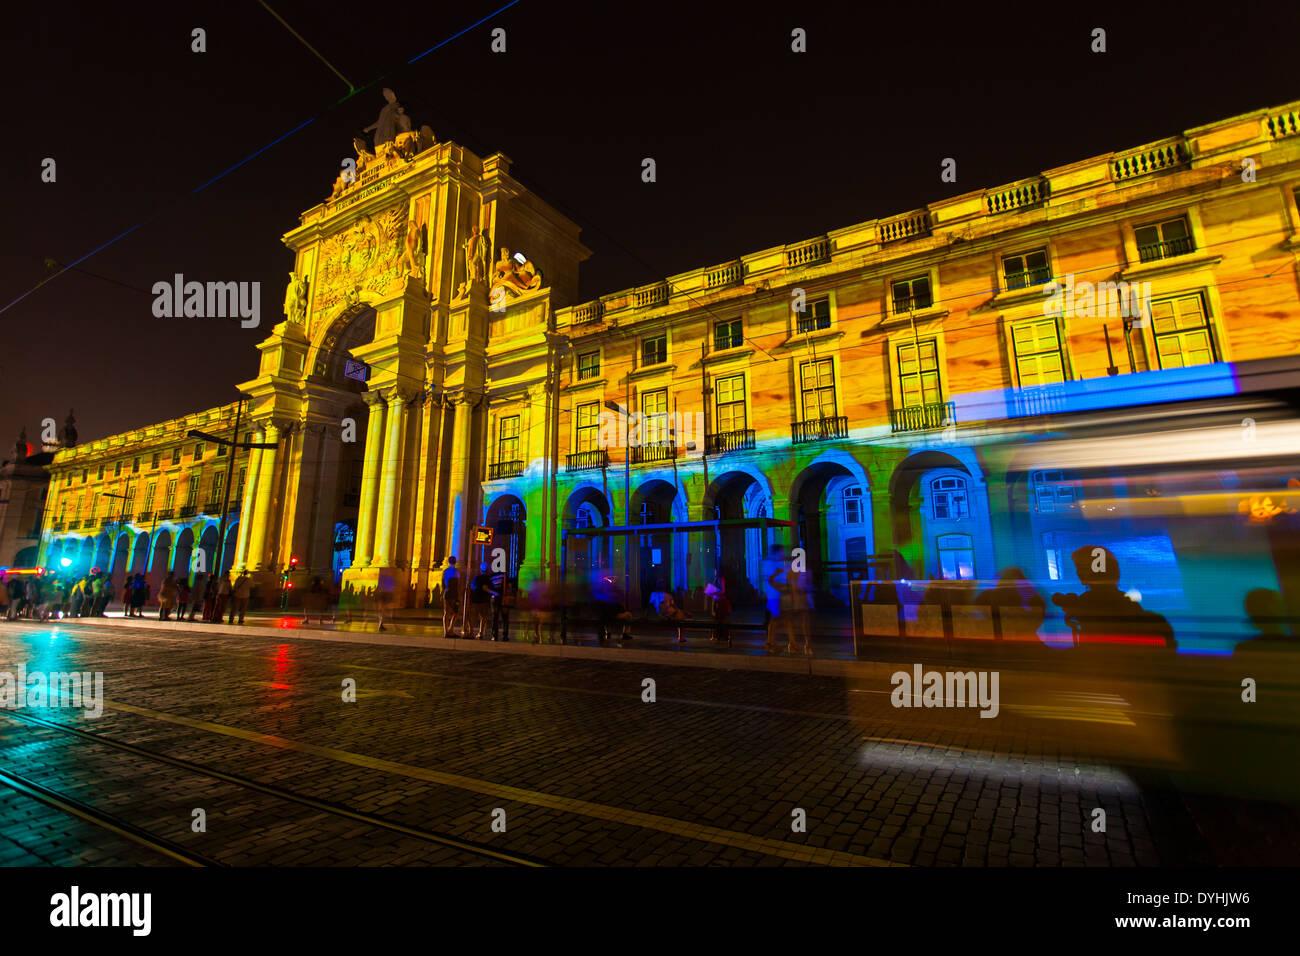 3D Light Show triumphal arch during a 3d outdoor light show - the arch of light